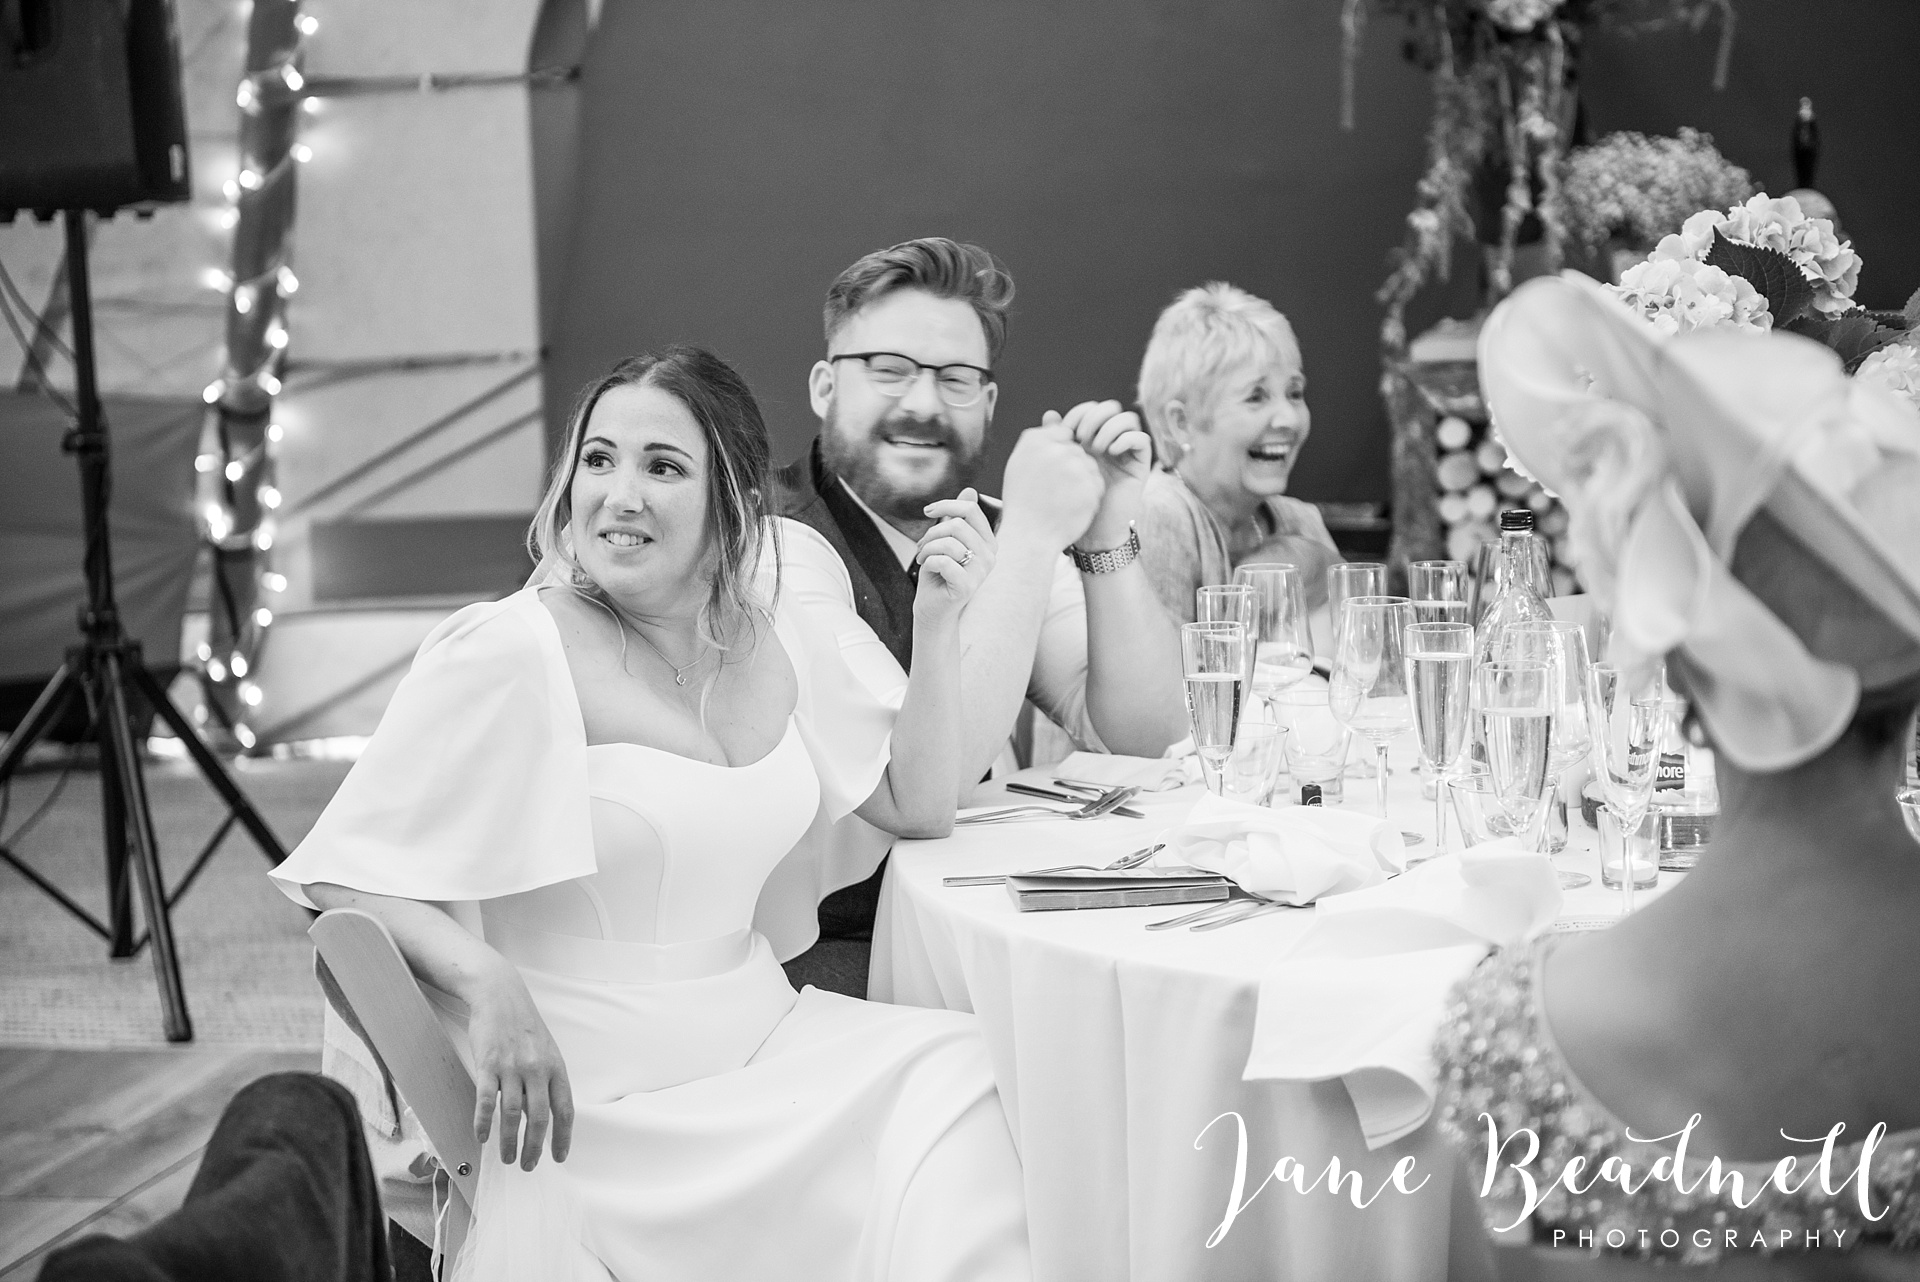 fine-art-wedding-photographer-jane-beadnell-yorkshire-wedding-photographer_0135